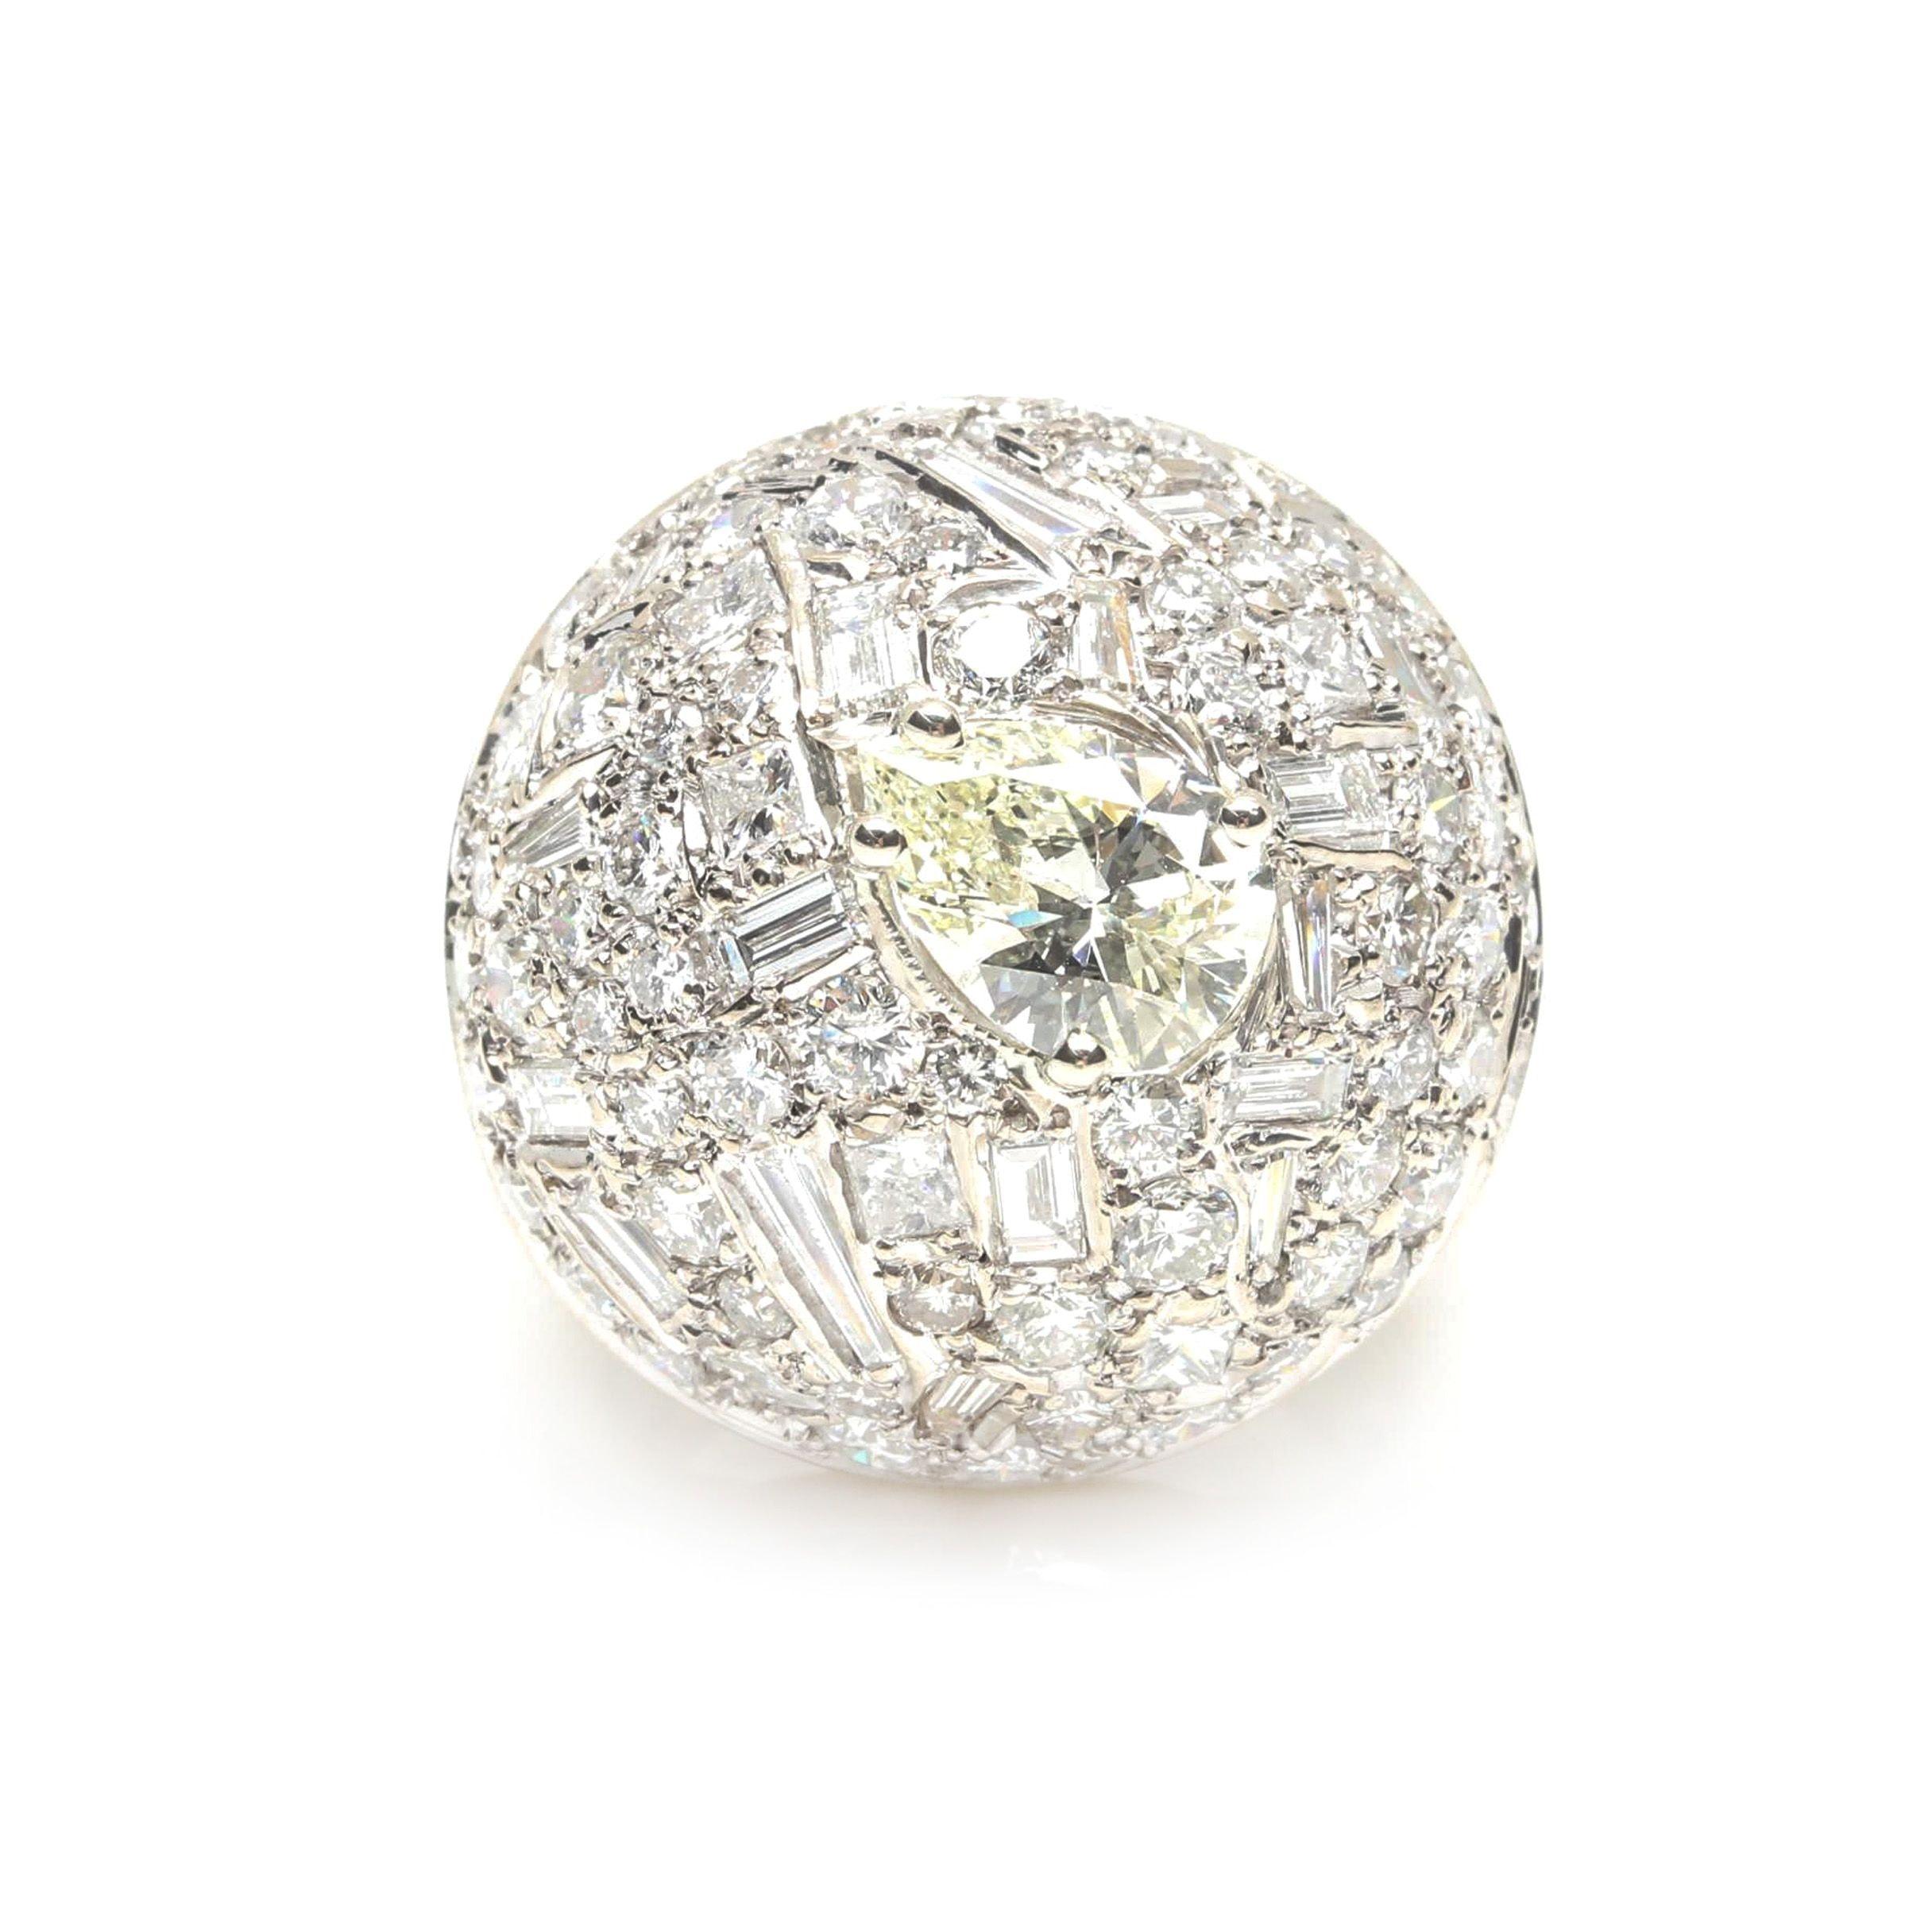 14K White Gold 5.38 CTW Diamond Ring